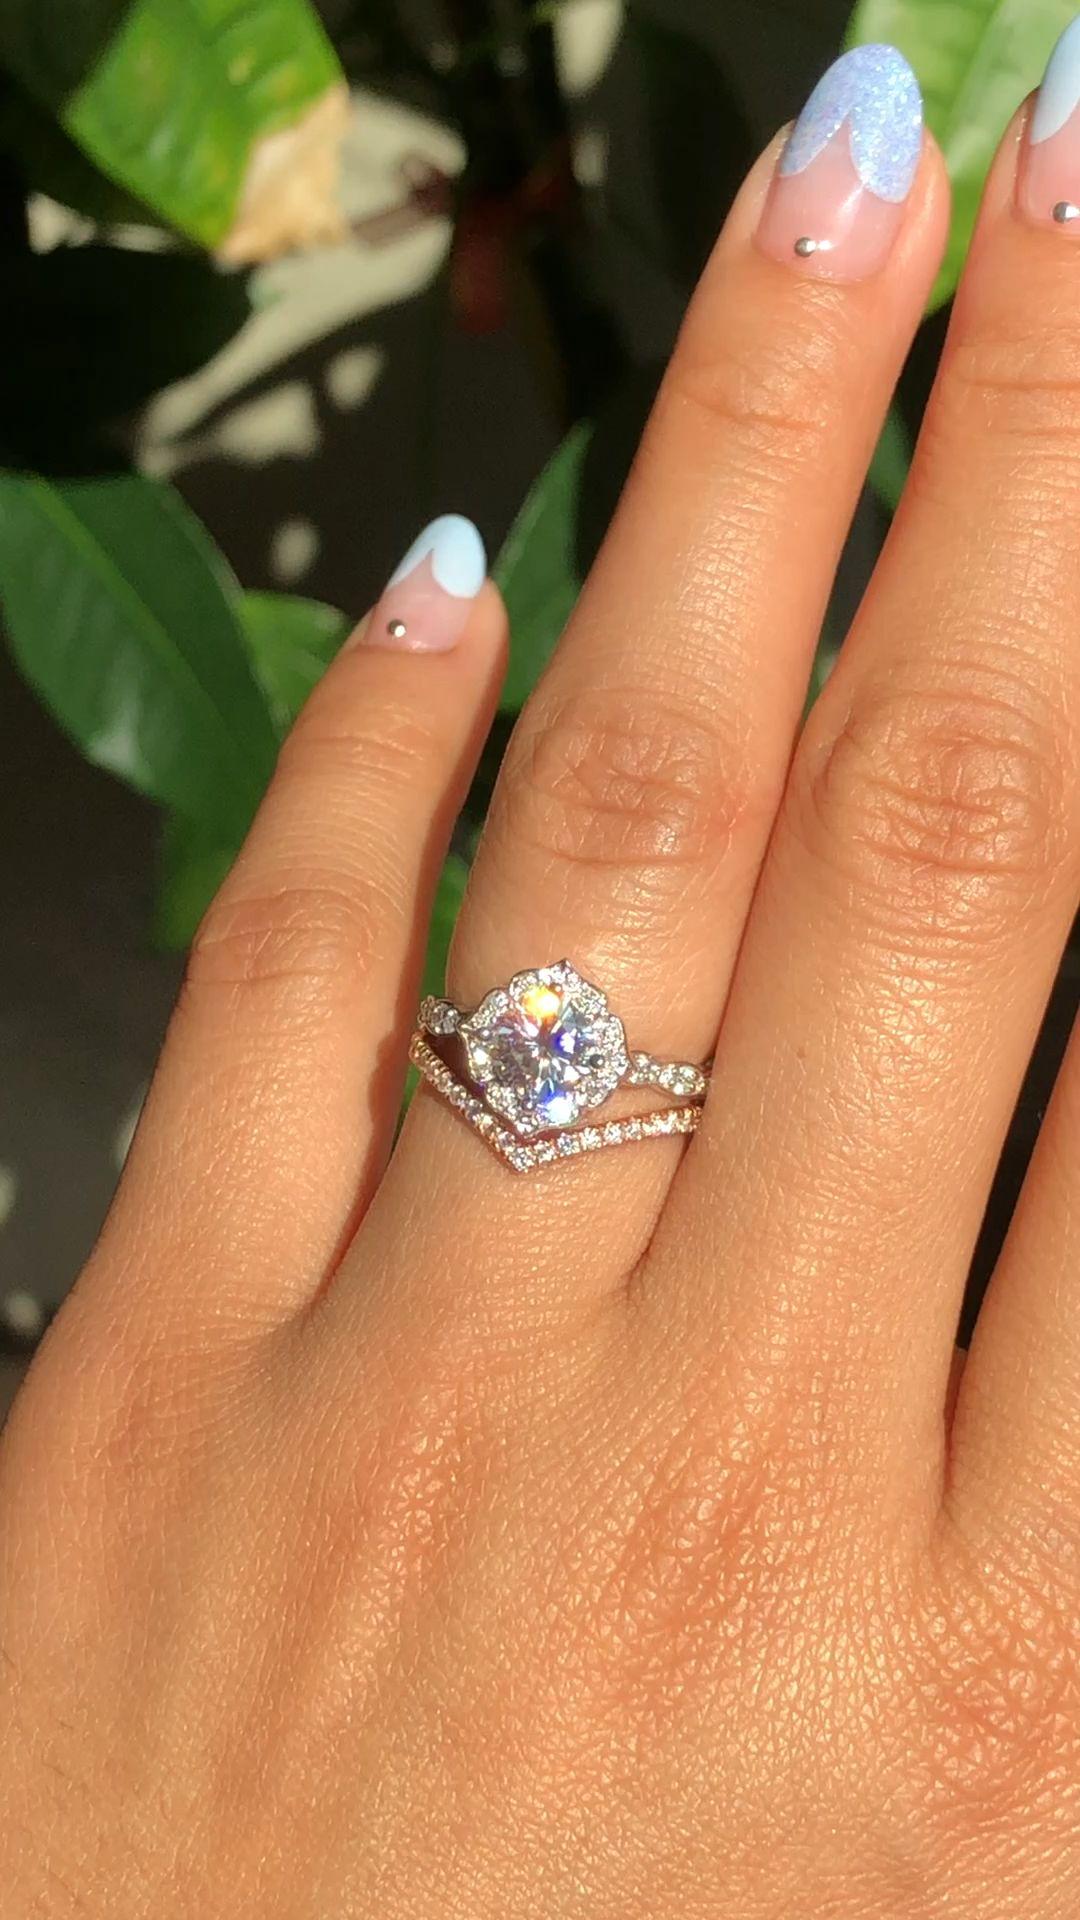 Mini Vintage Floral Moissanite Ring+ Chevron Diamond Wedding Band by La More Design